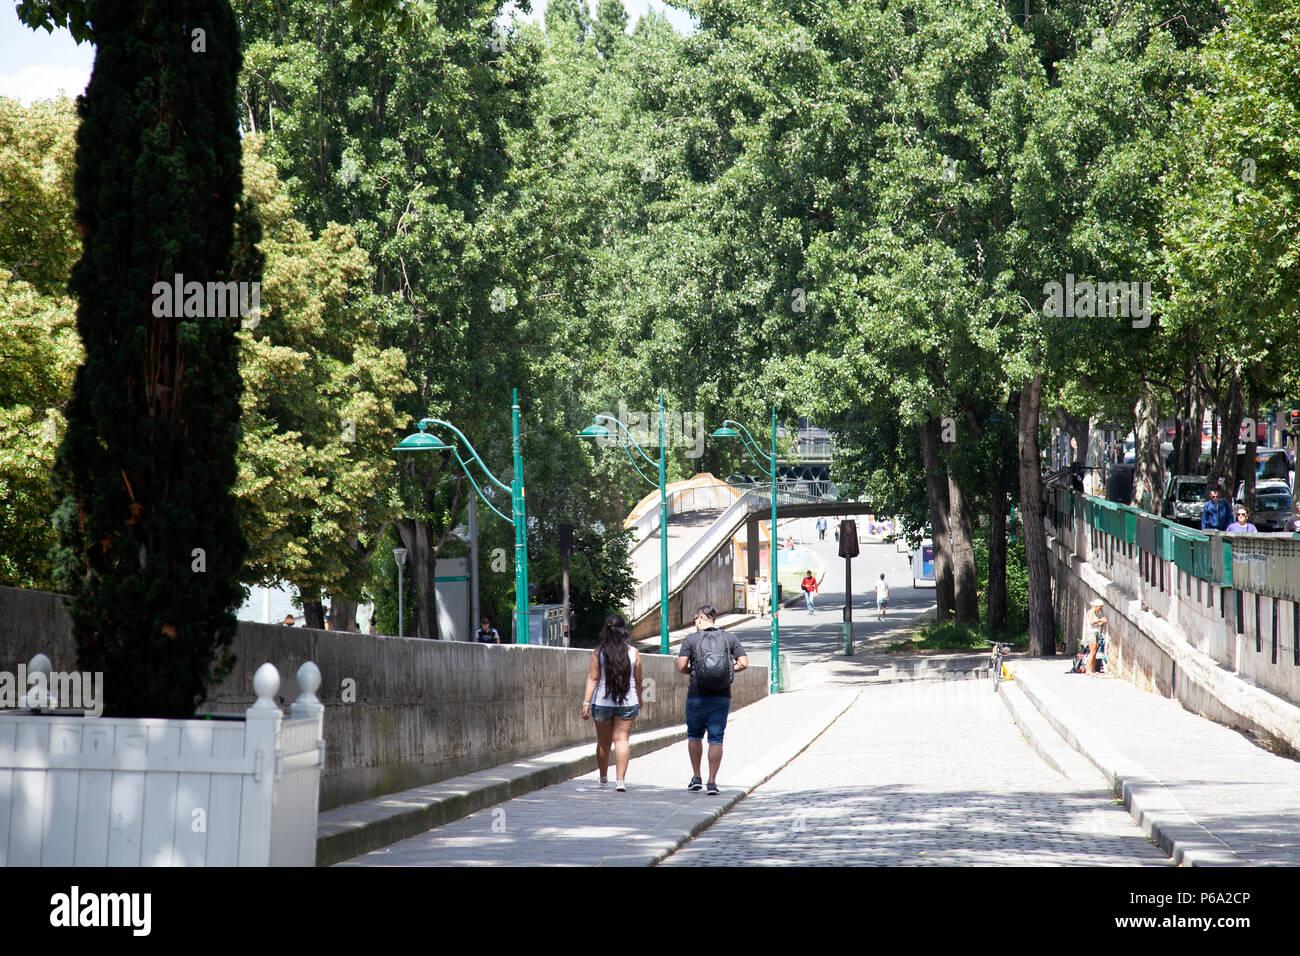 Seine Embankment Walkway Ramp - Paris France - Stock Image